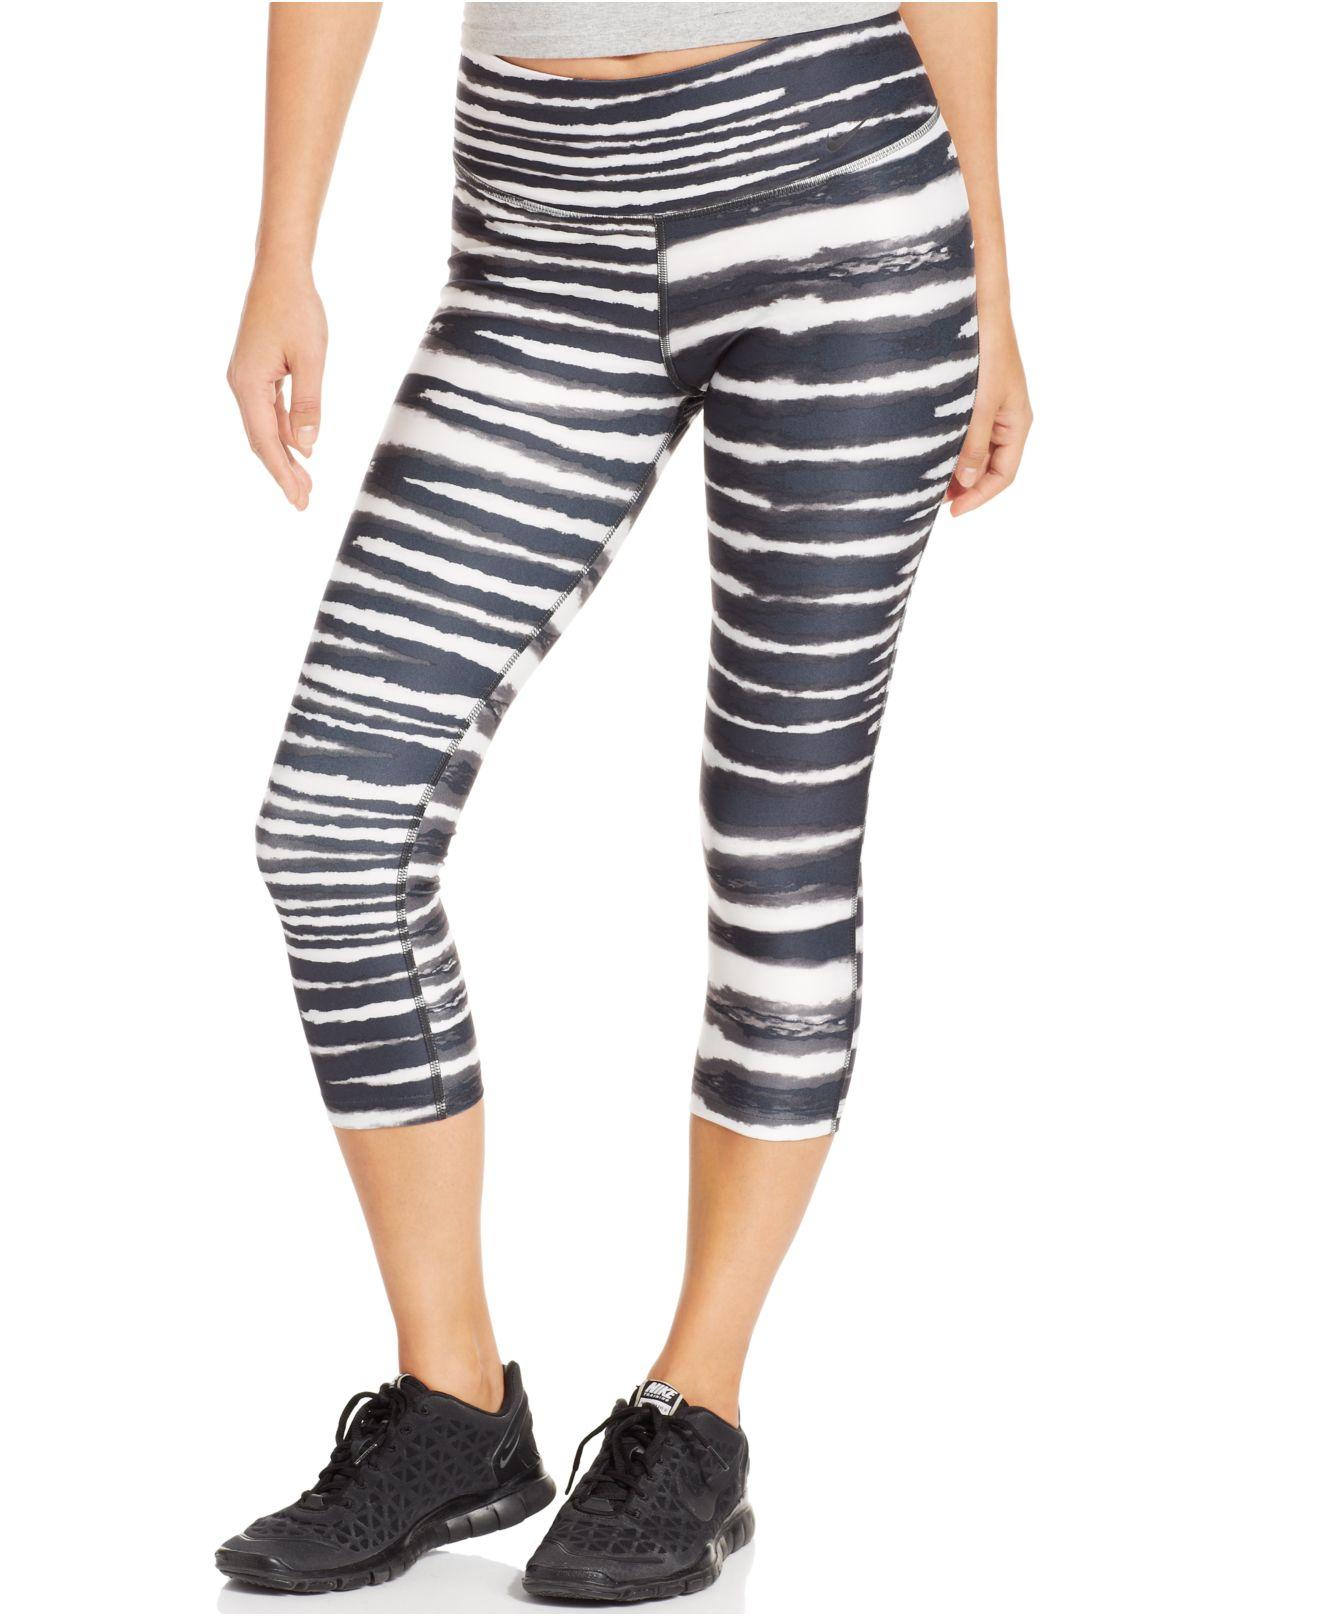 b98ab89880 Nike Legend 2.0 Tiger-Stripe Dri-Fit Capri Leggings in Gray - Lyst